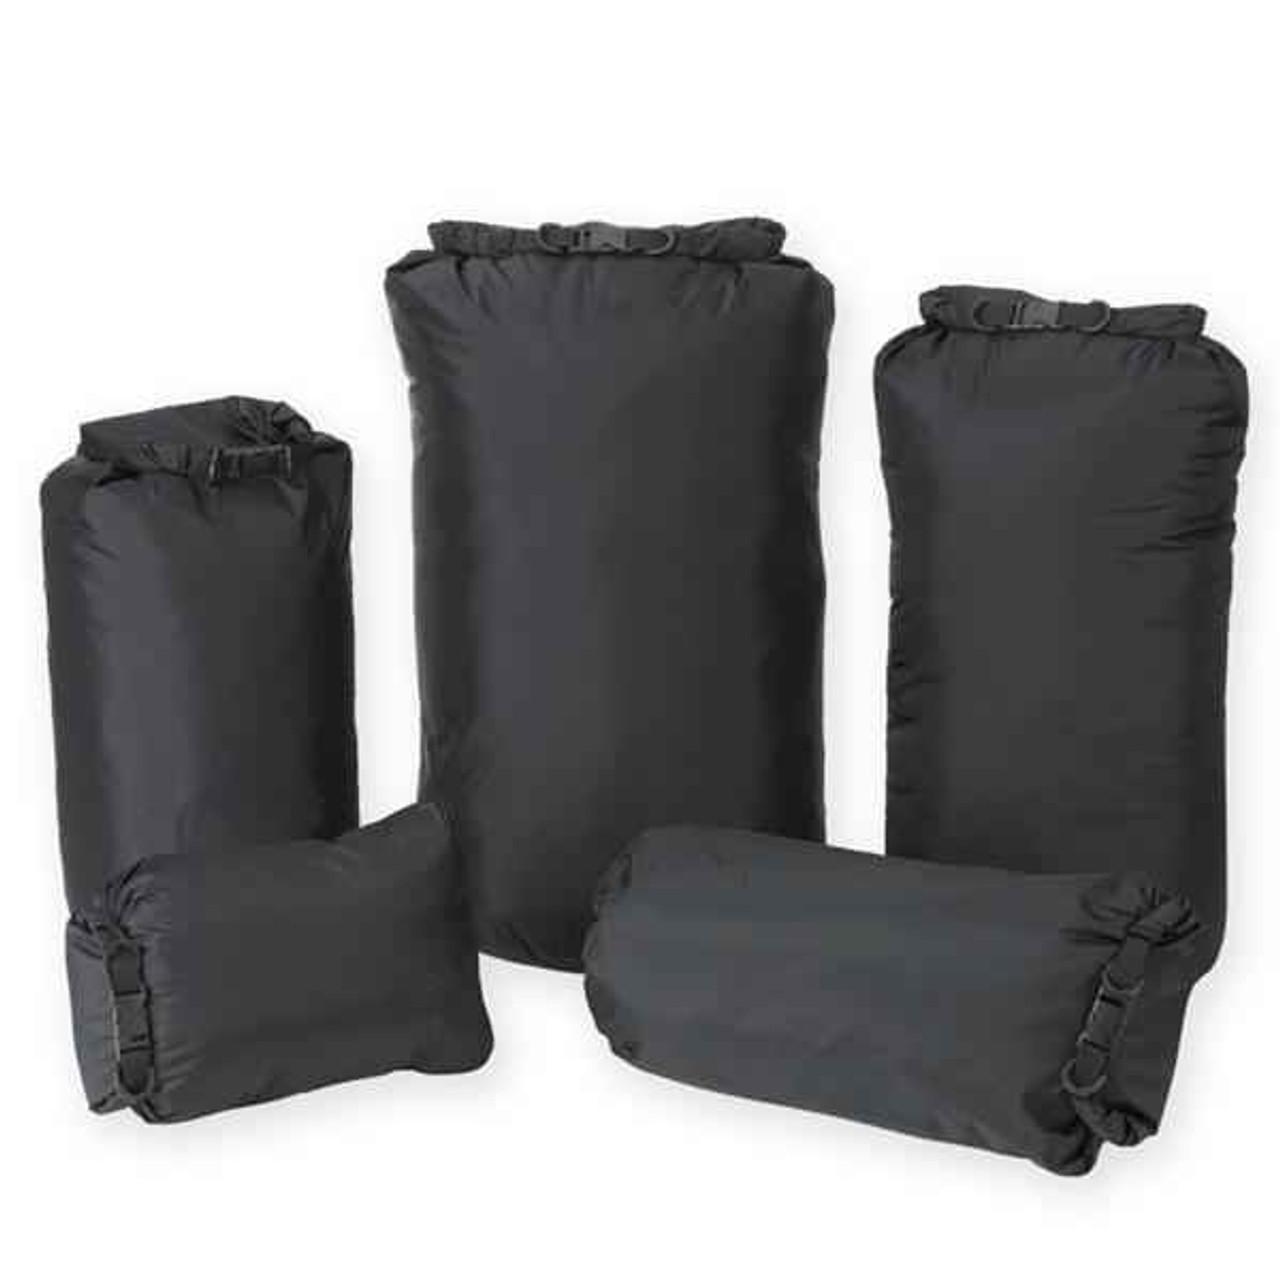 Pro Force Dri-Sak Waterproof Bag - X Large, Black